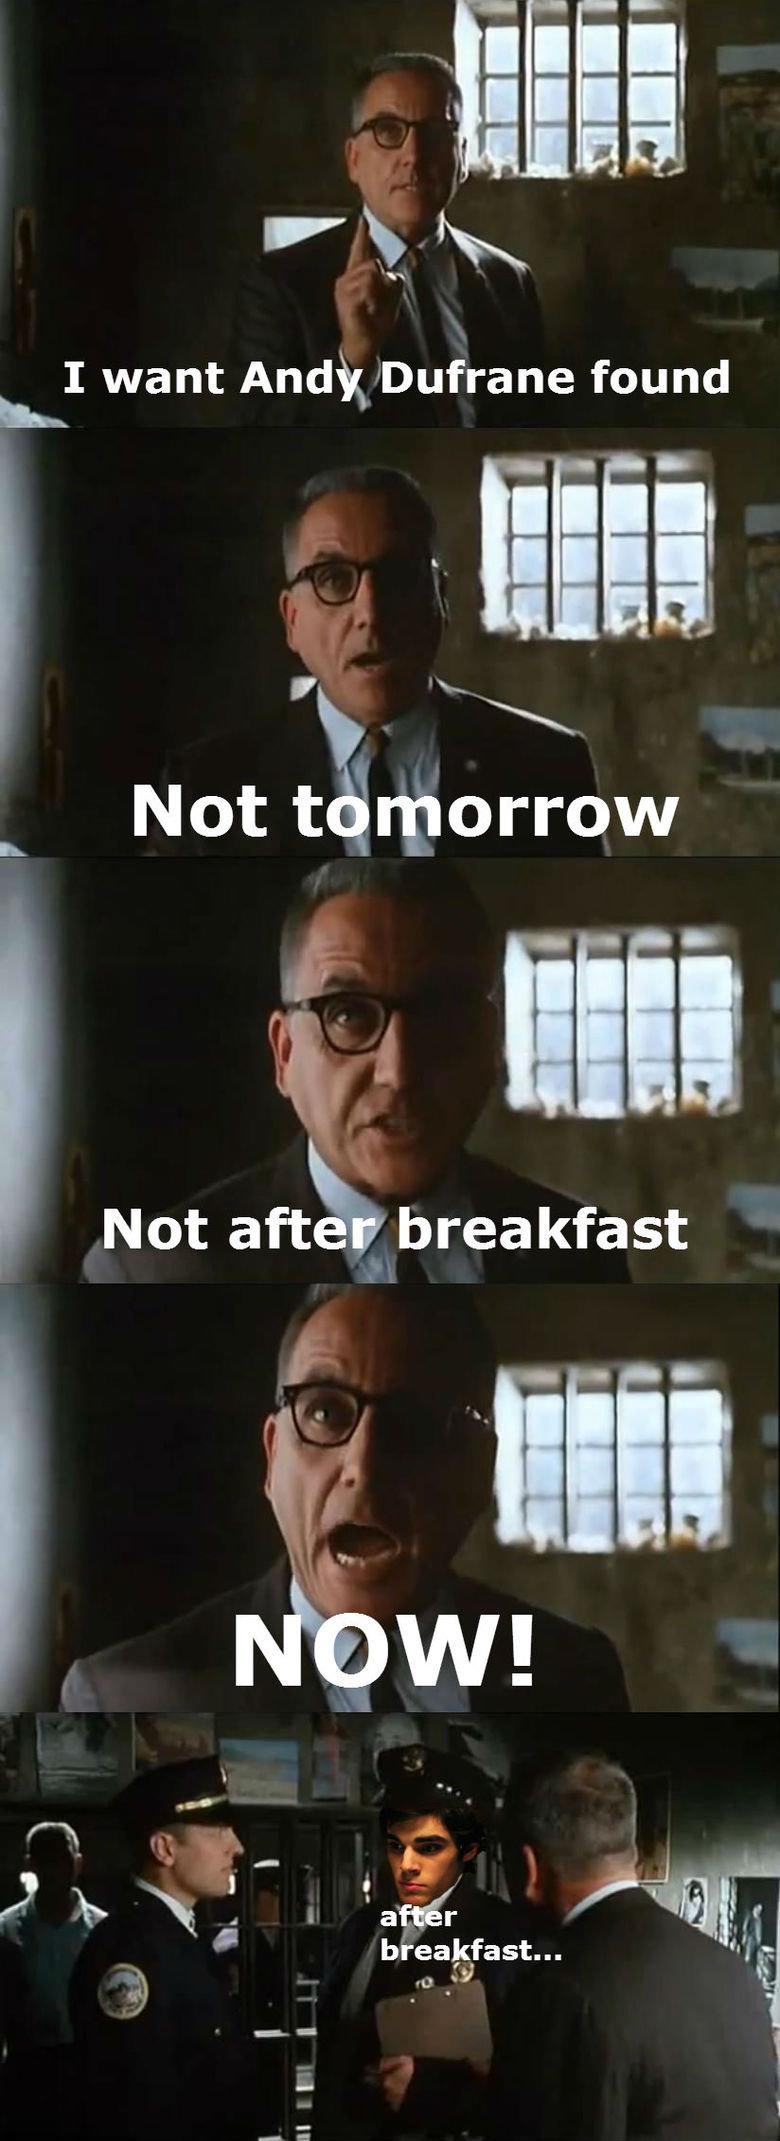 Shawshank. instagram.com/kendallmademebehere www.facebook.com/NoblemanLyfe?ref=hl.. I do my killing...after breakfast.